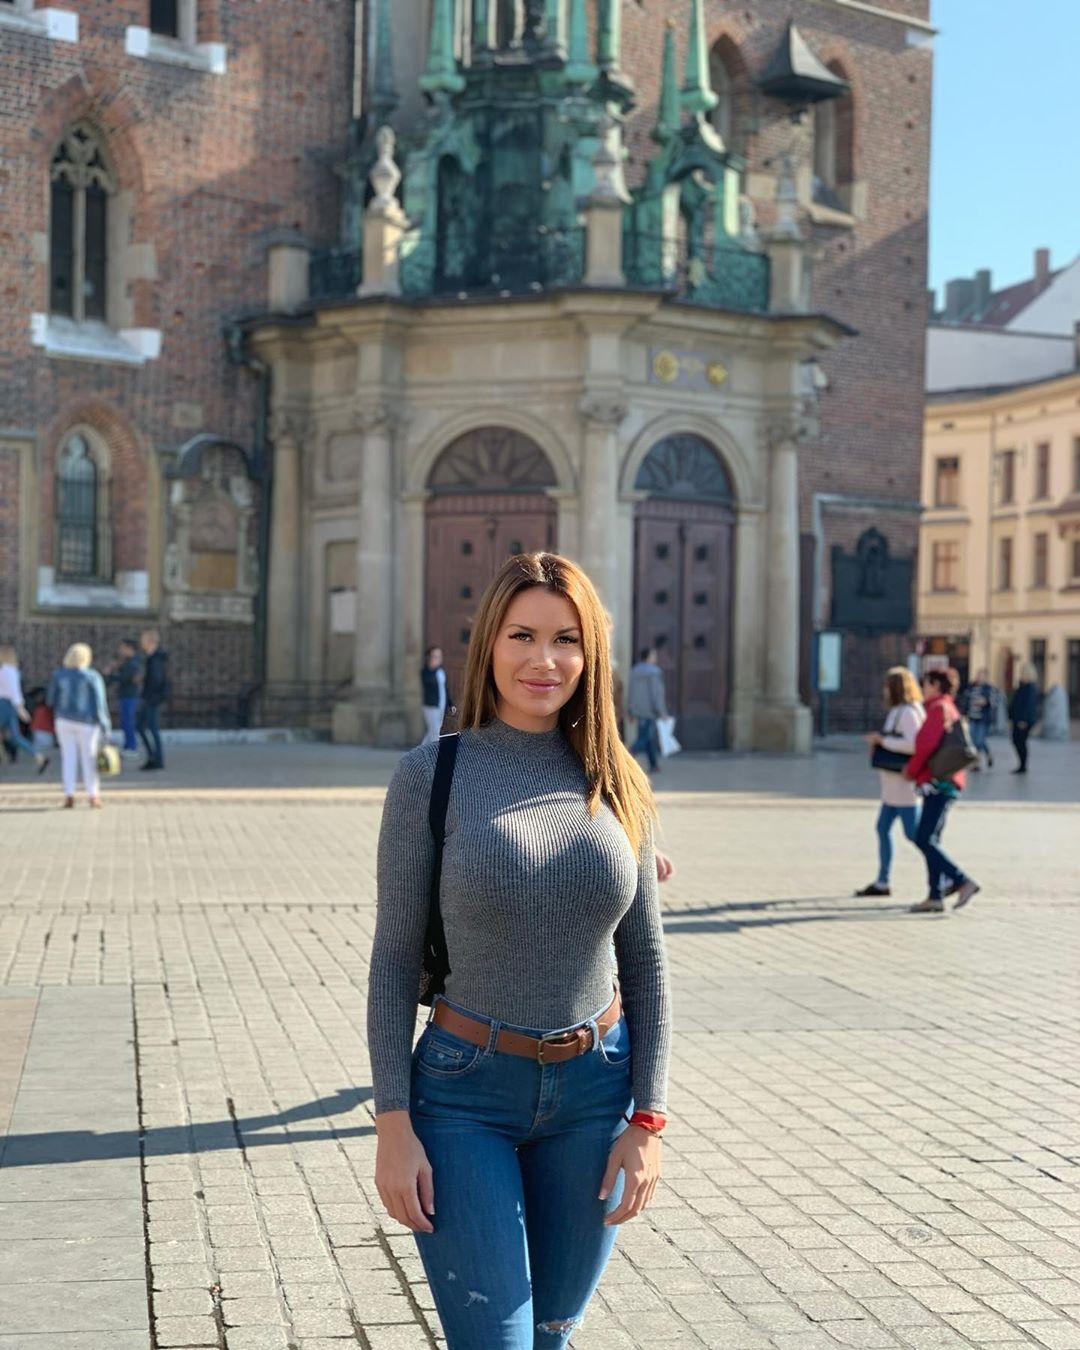 Tania-Barbara-Wallpapers-Insta-Fit-Bio-4